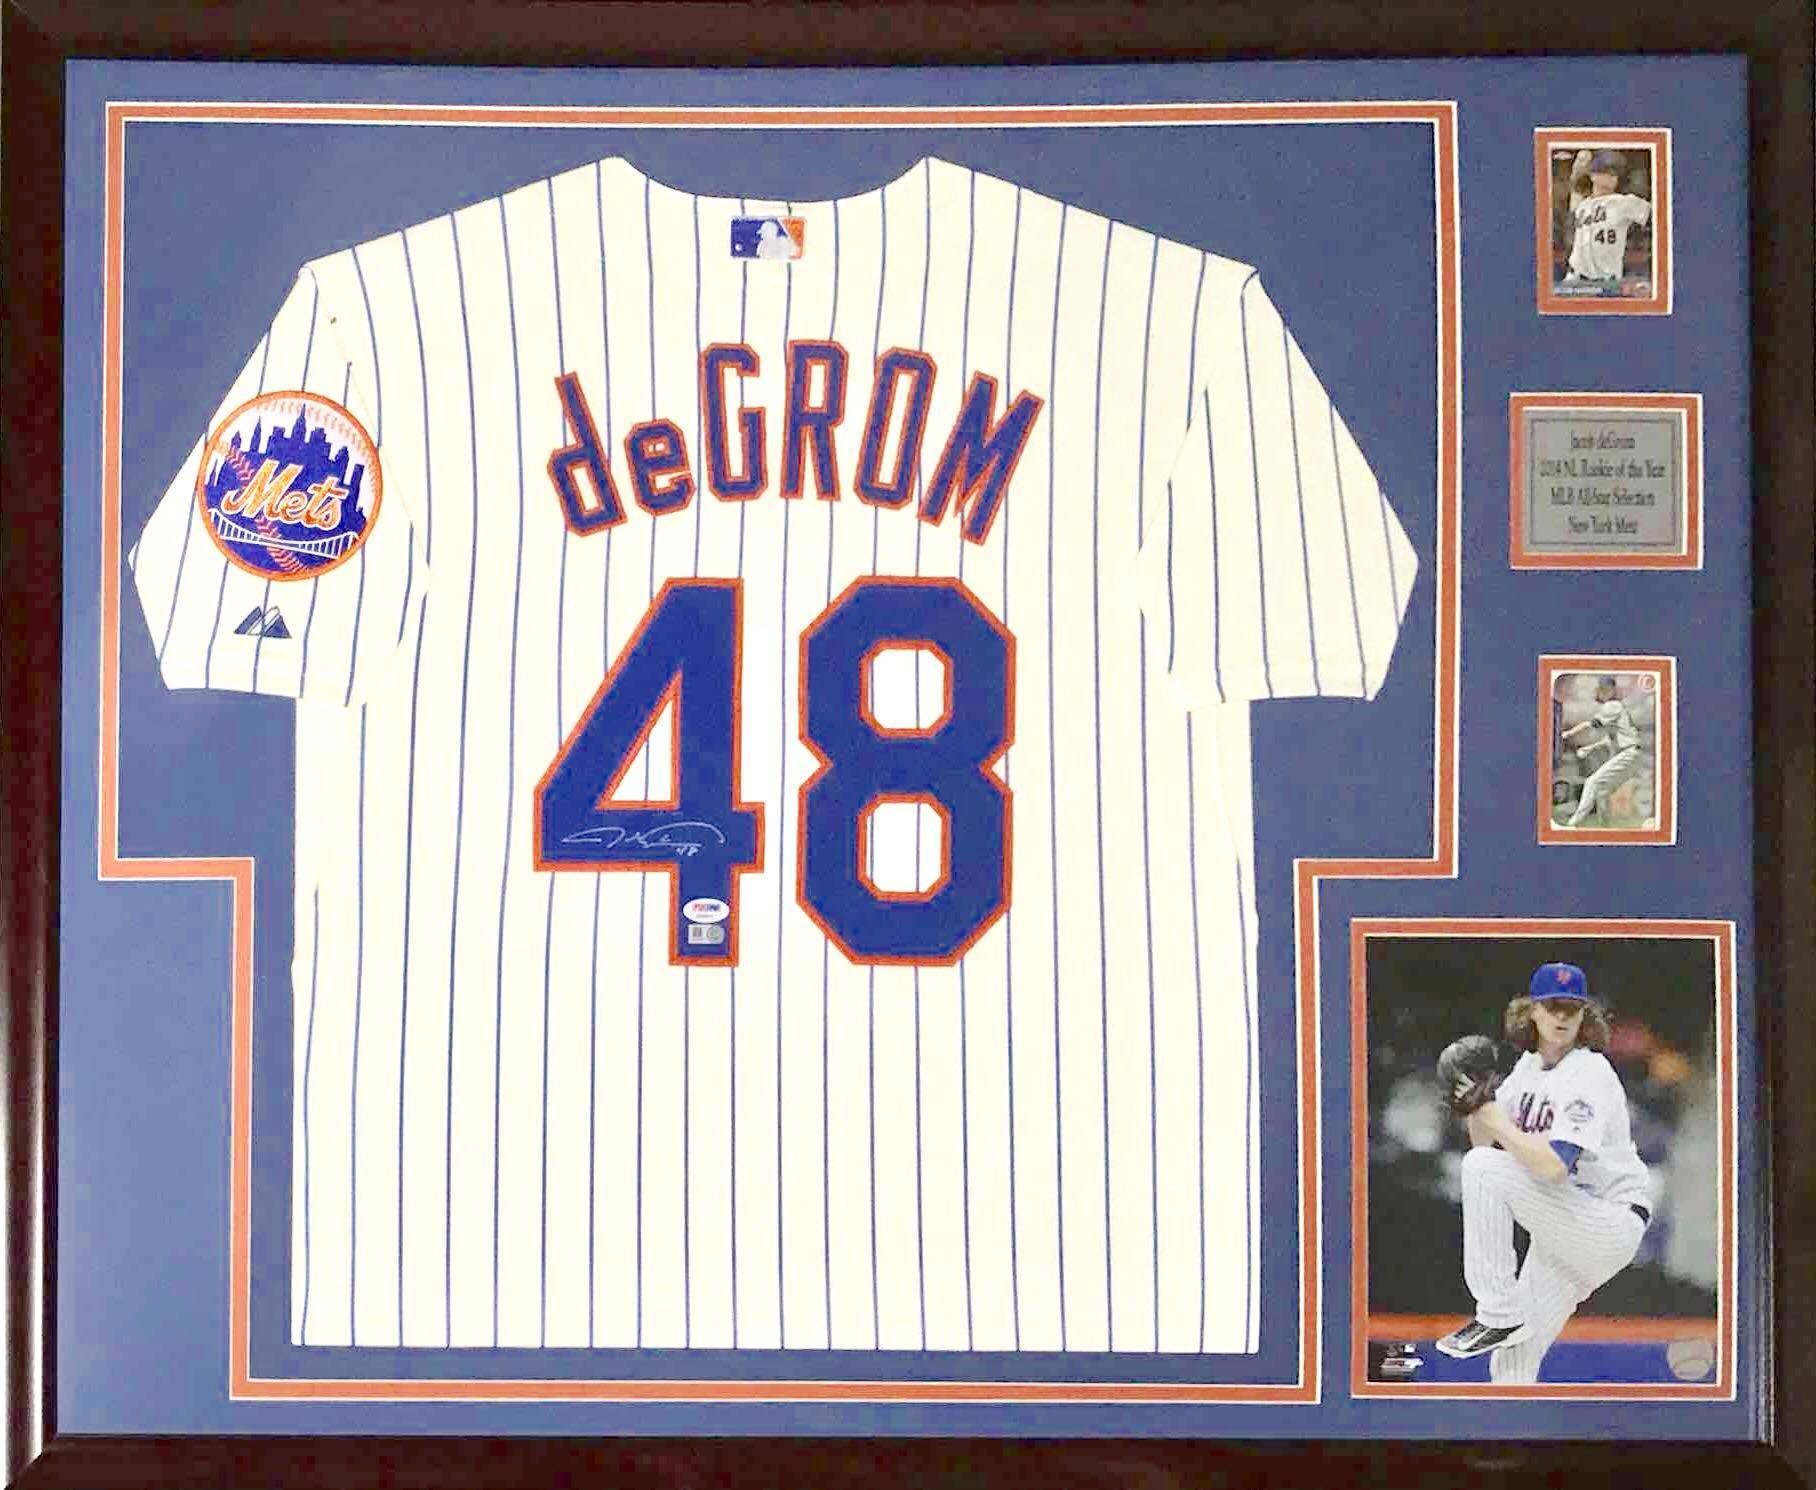 jacobdeGrom #Mets framed jersey #jerseyframing #framedjersey ...